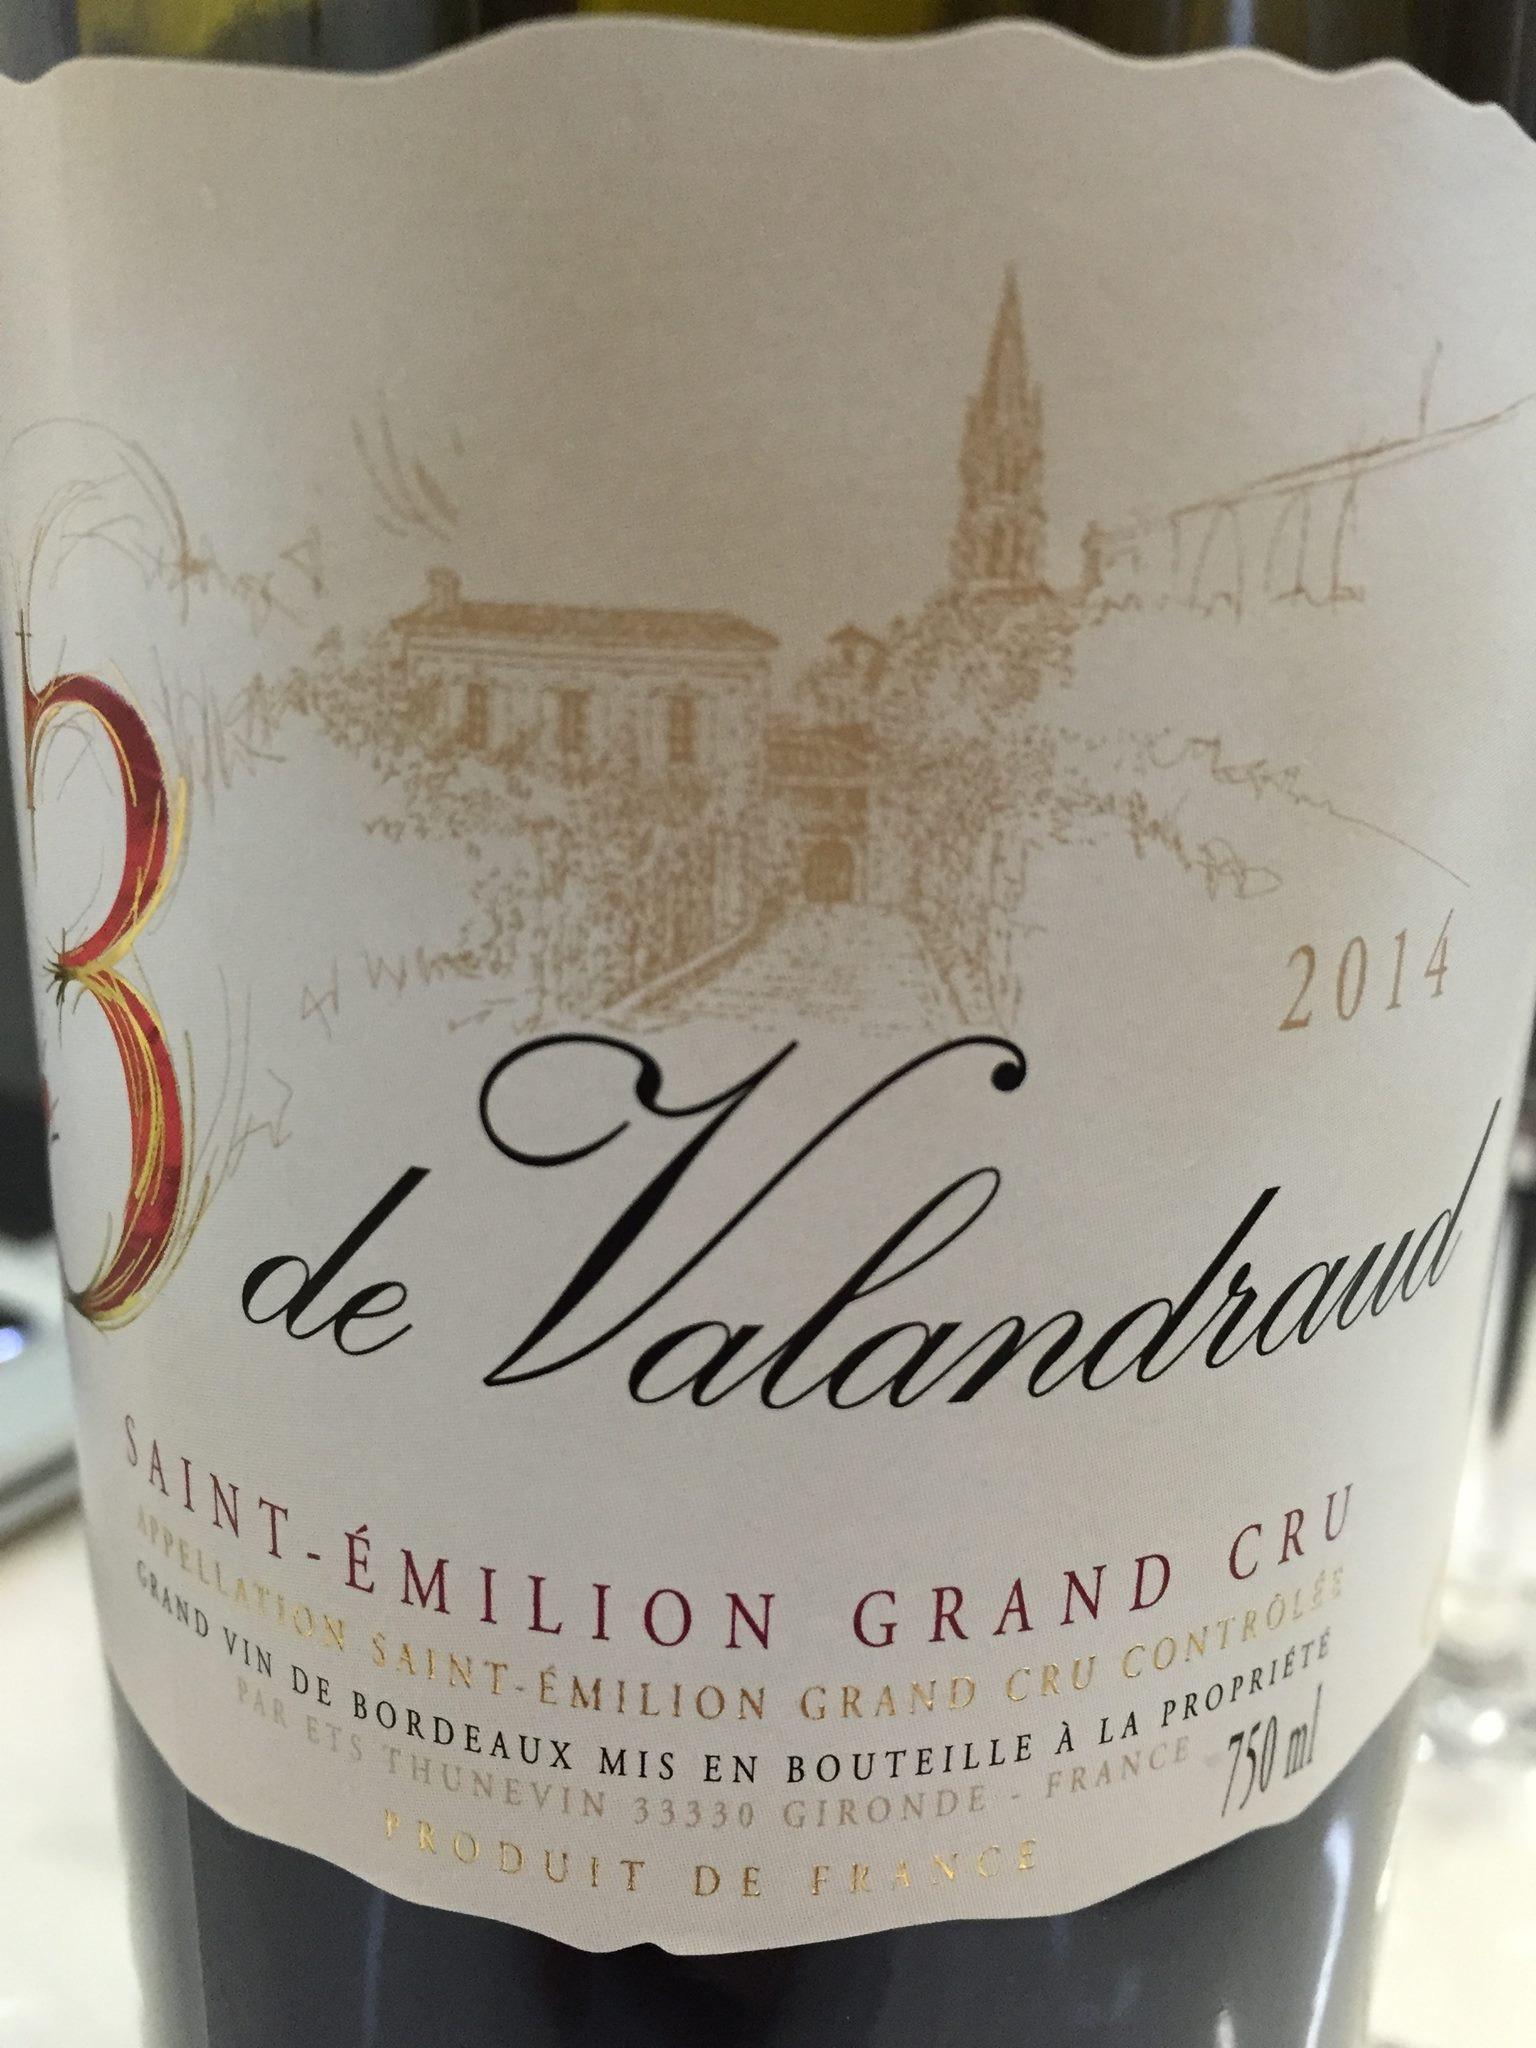 3 de Valandraud 2015 – Saint-Emilion Grand Cru